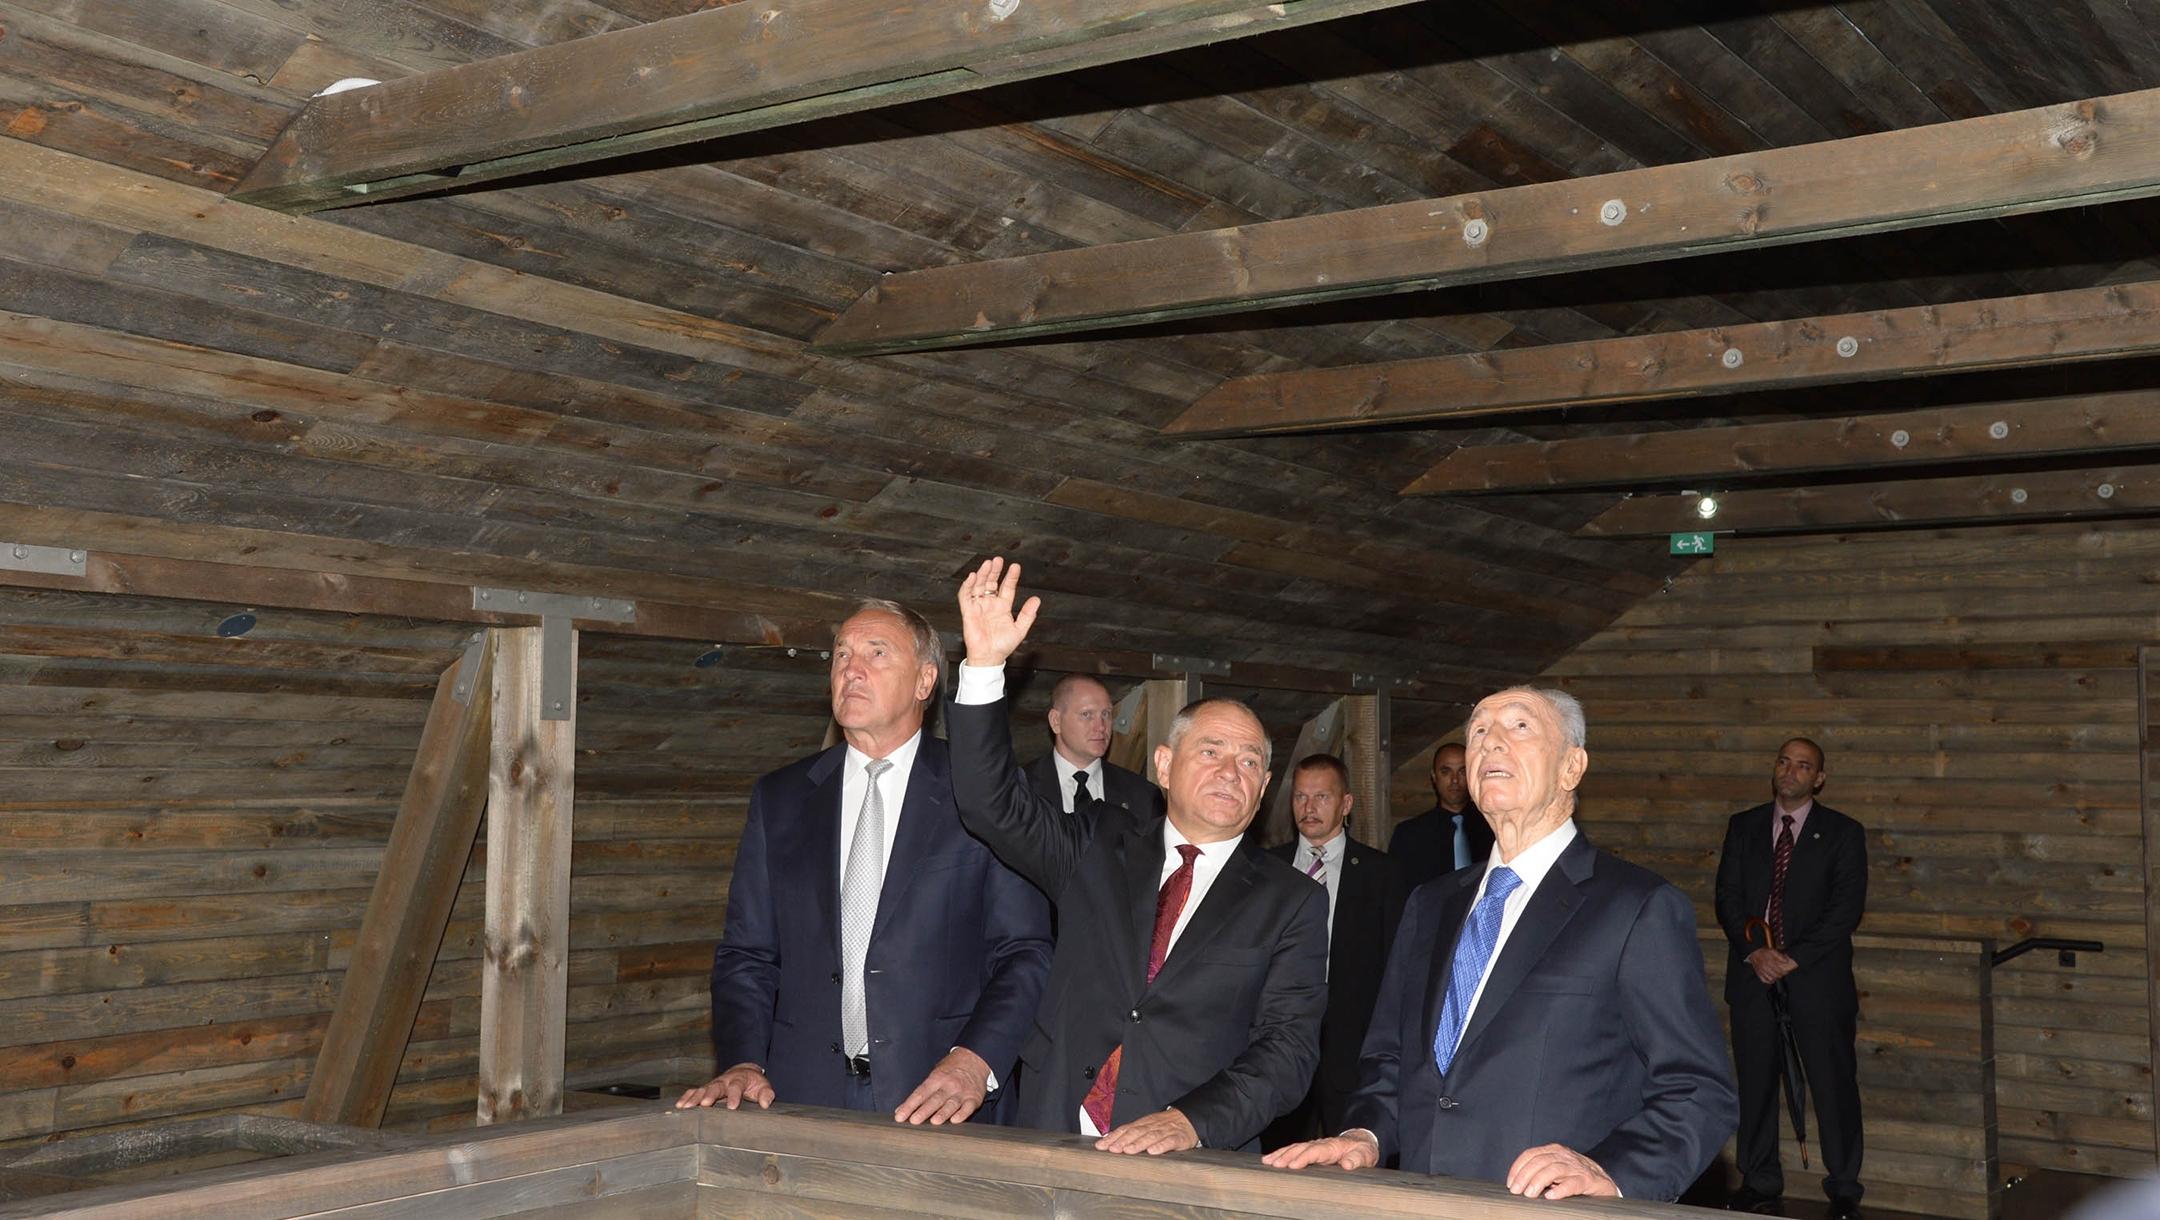 Israeli President Shimon Peres, right, and Latvia President Andris Berzinns attend the opening of the Zanis Lipke Memorial Museum in Riga, Latvia on July 30, 2013 . (Moshe Milner/GPO via Getty Images)